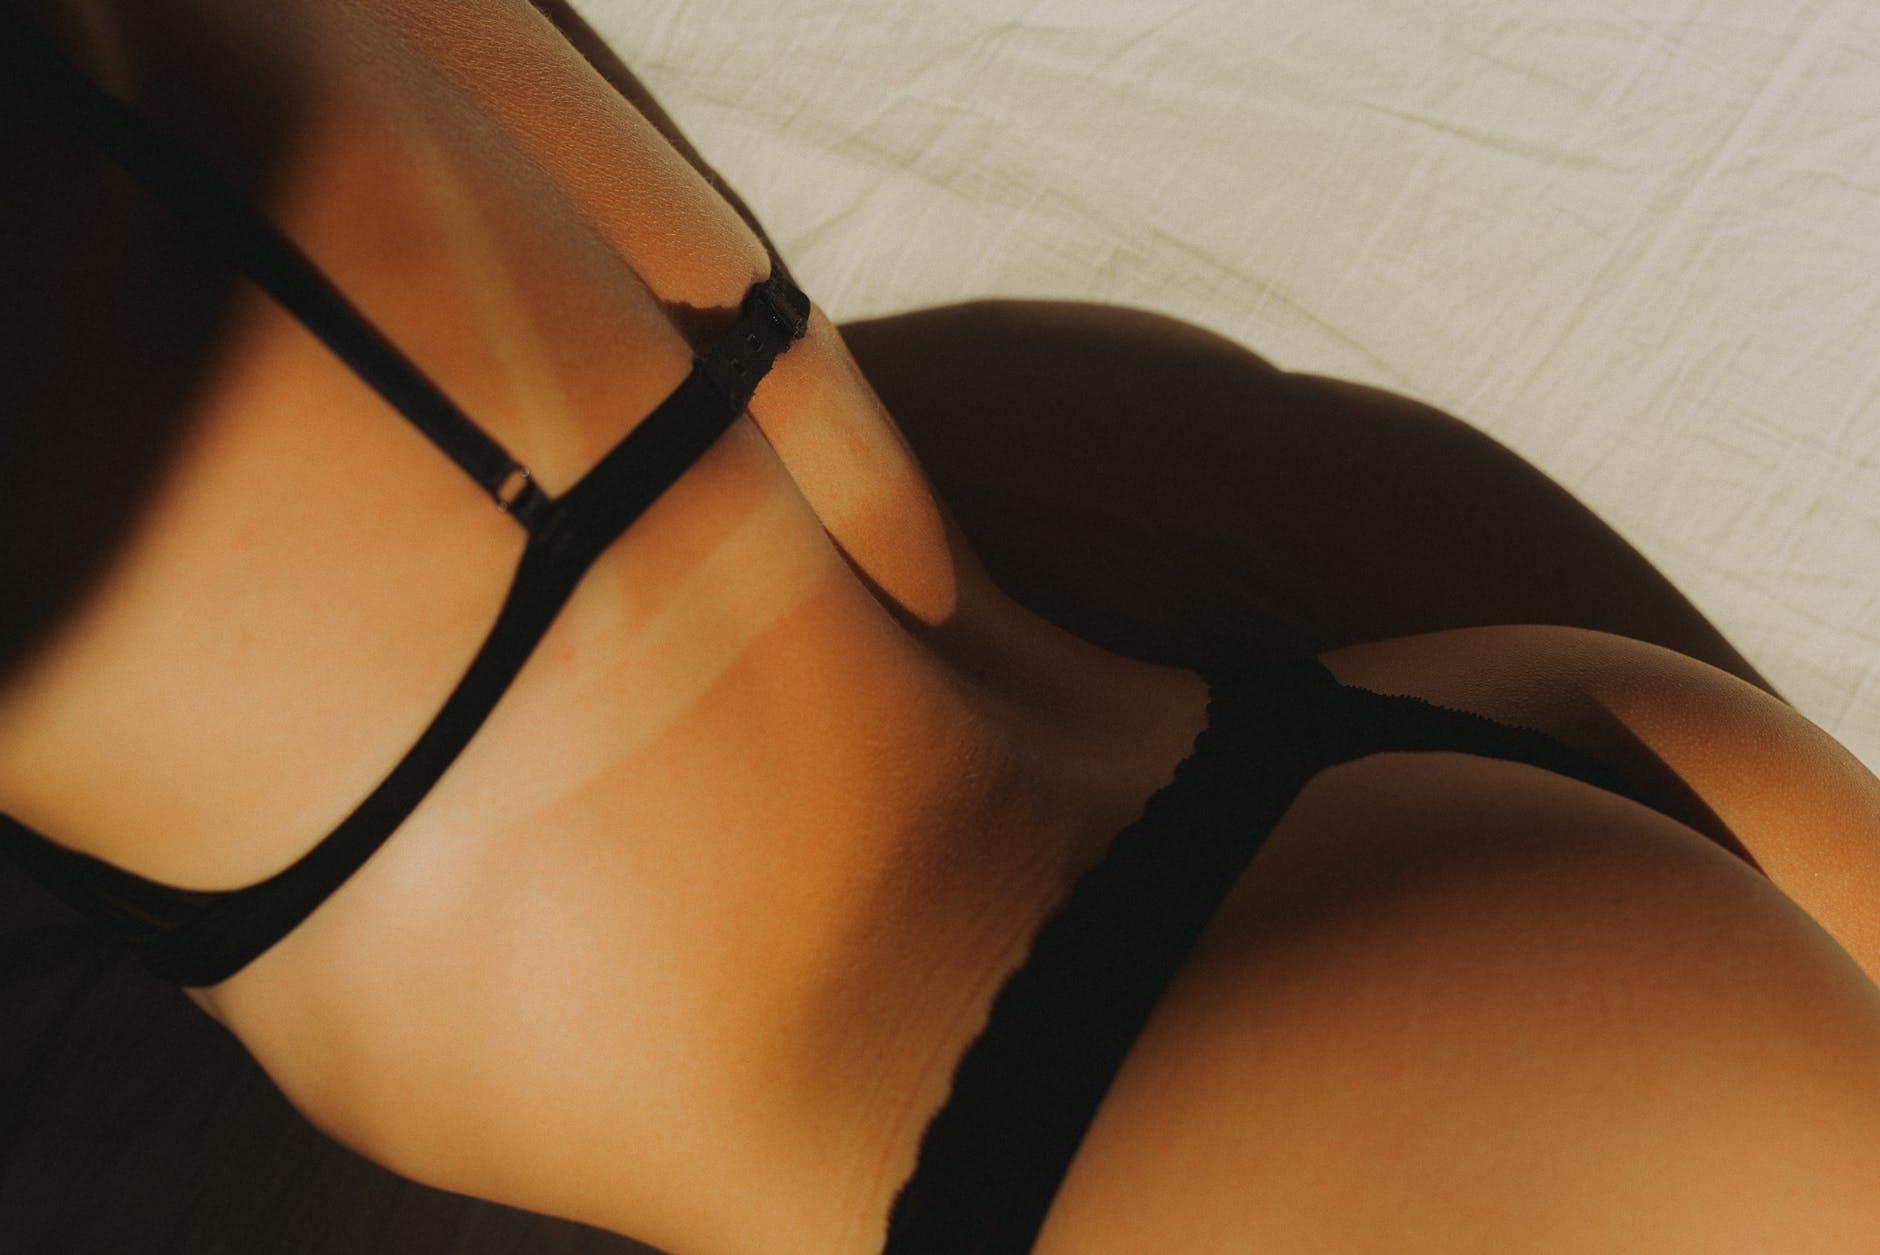 ženské telo, erotika